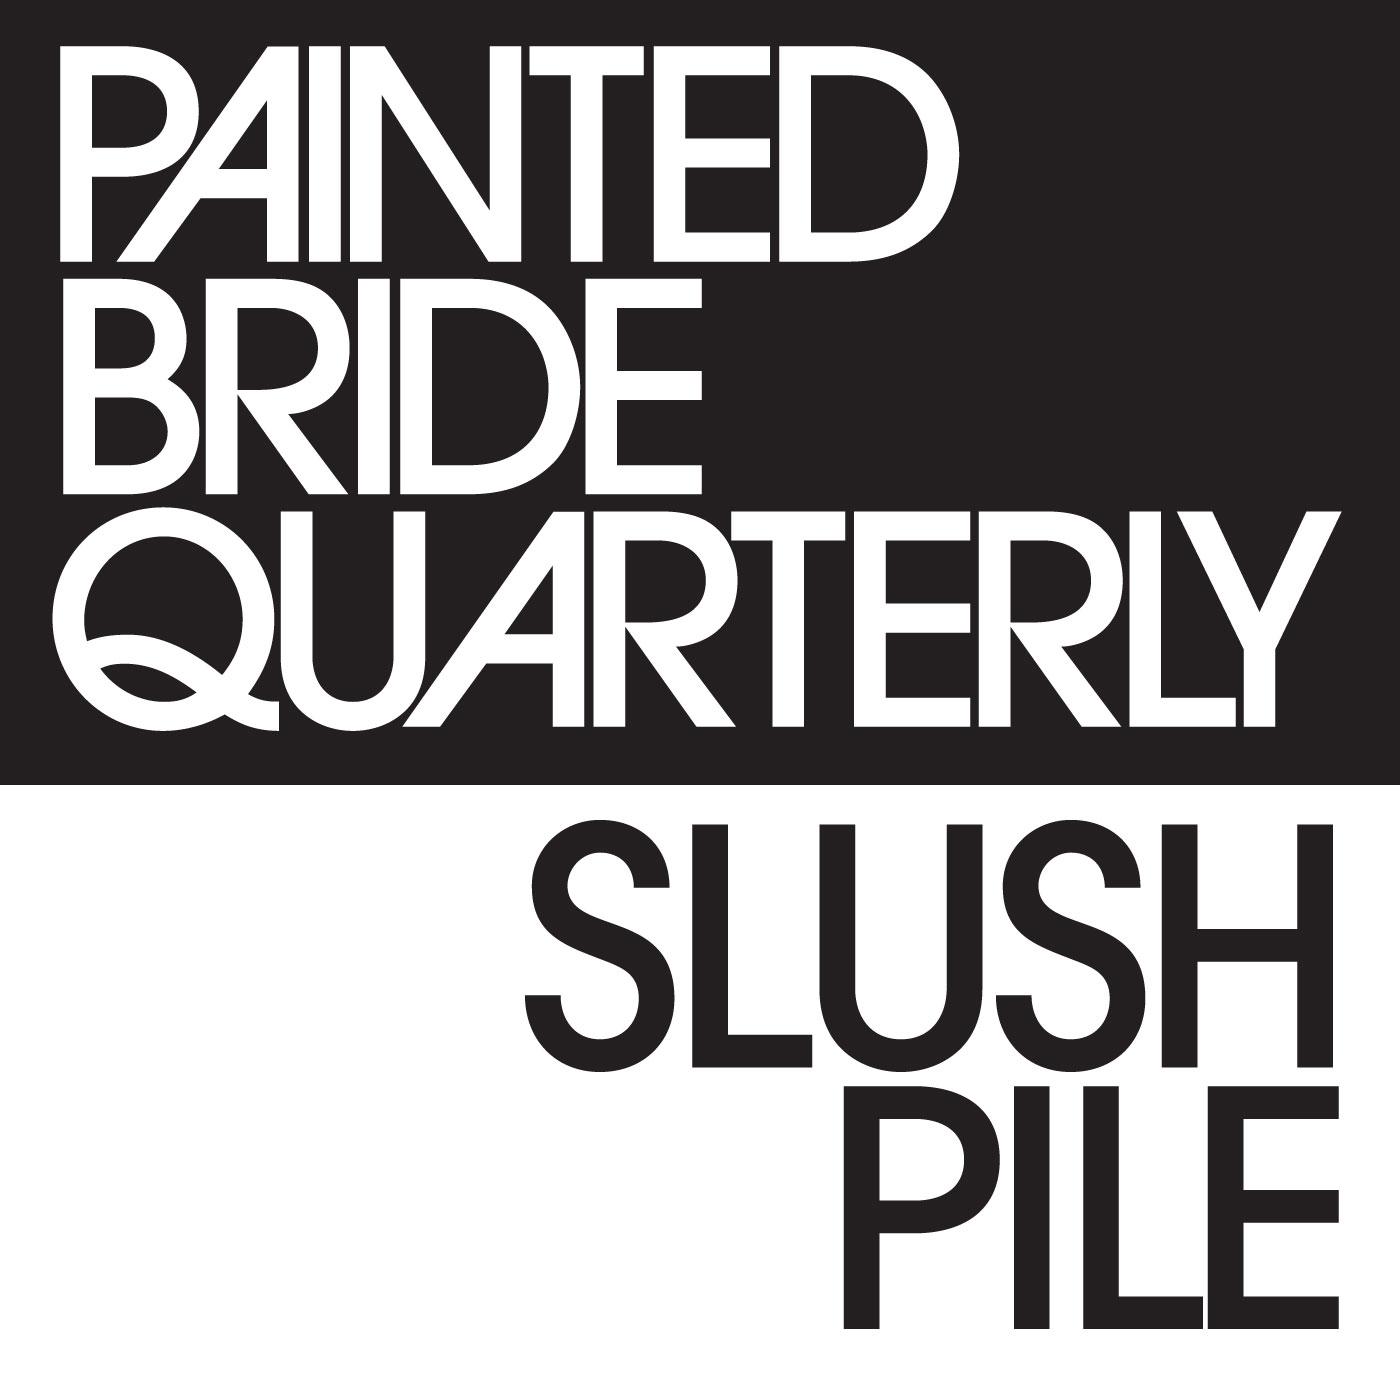 Painted Bride Quarterly s Slush Pile